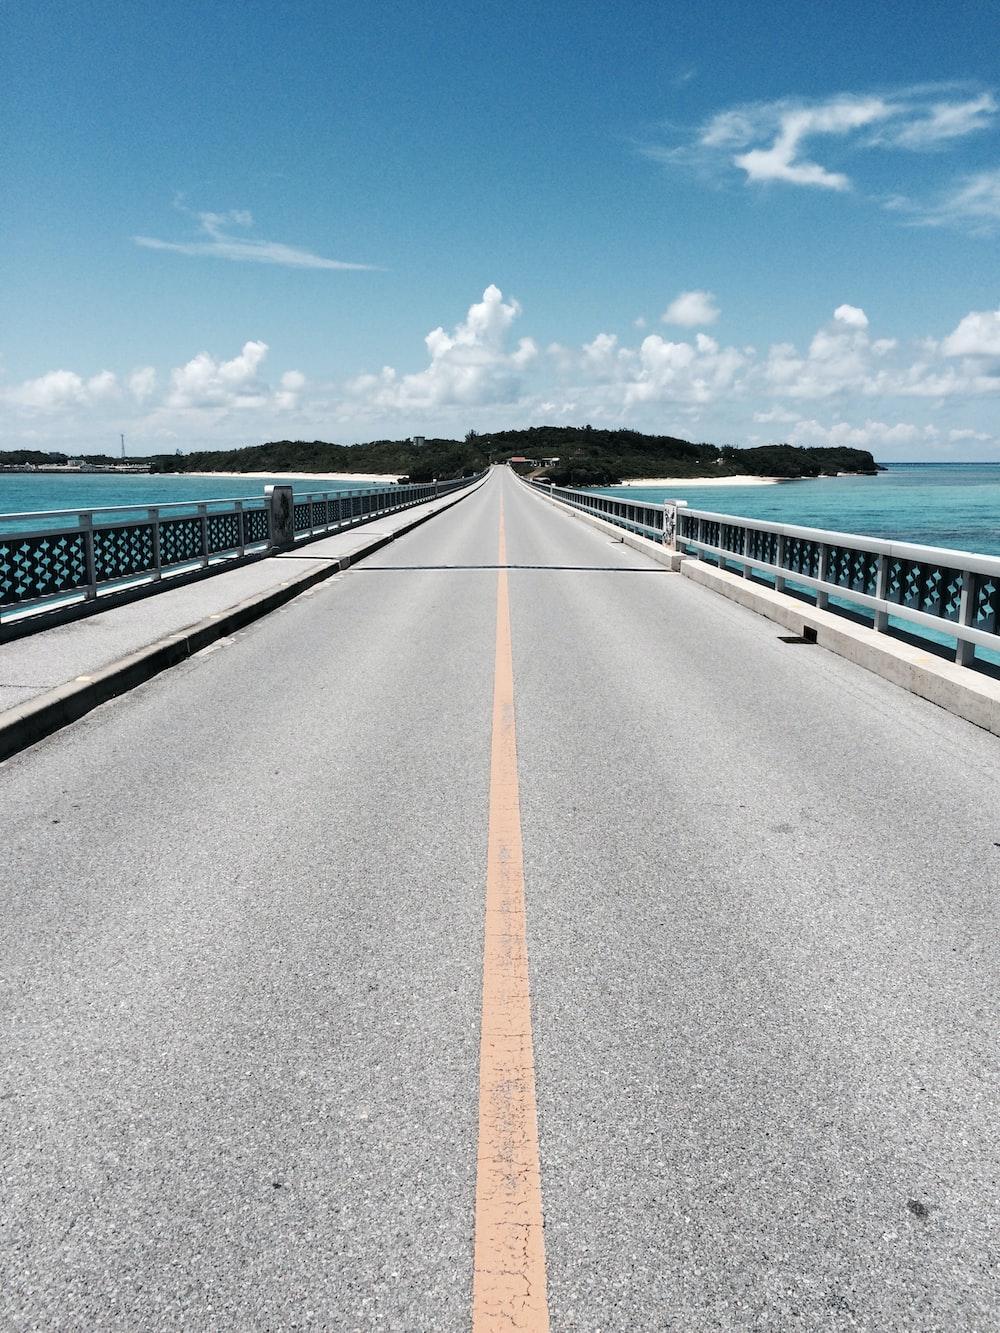 asphalt road near mountain under blue and white cloudy sky